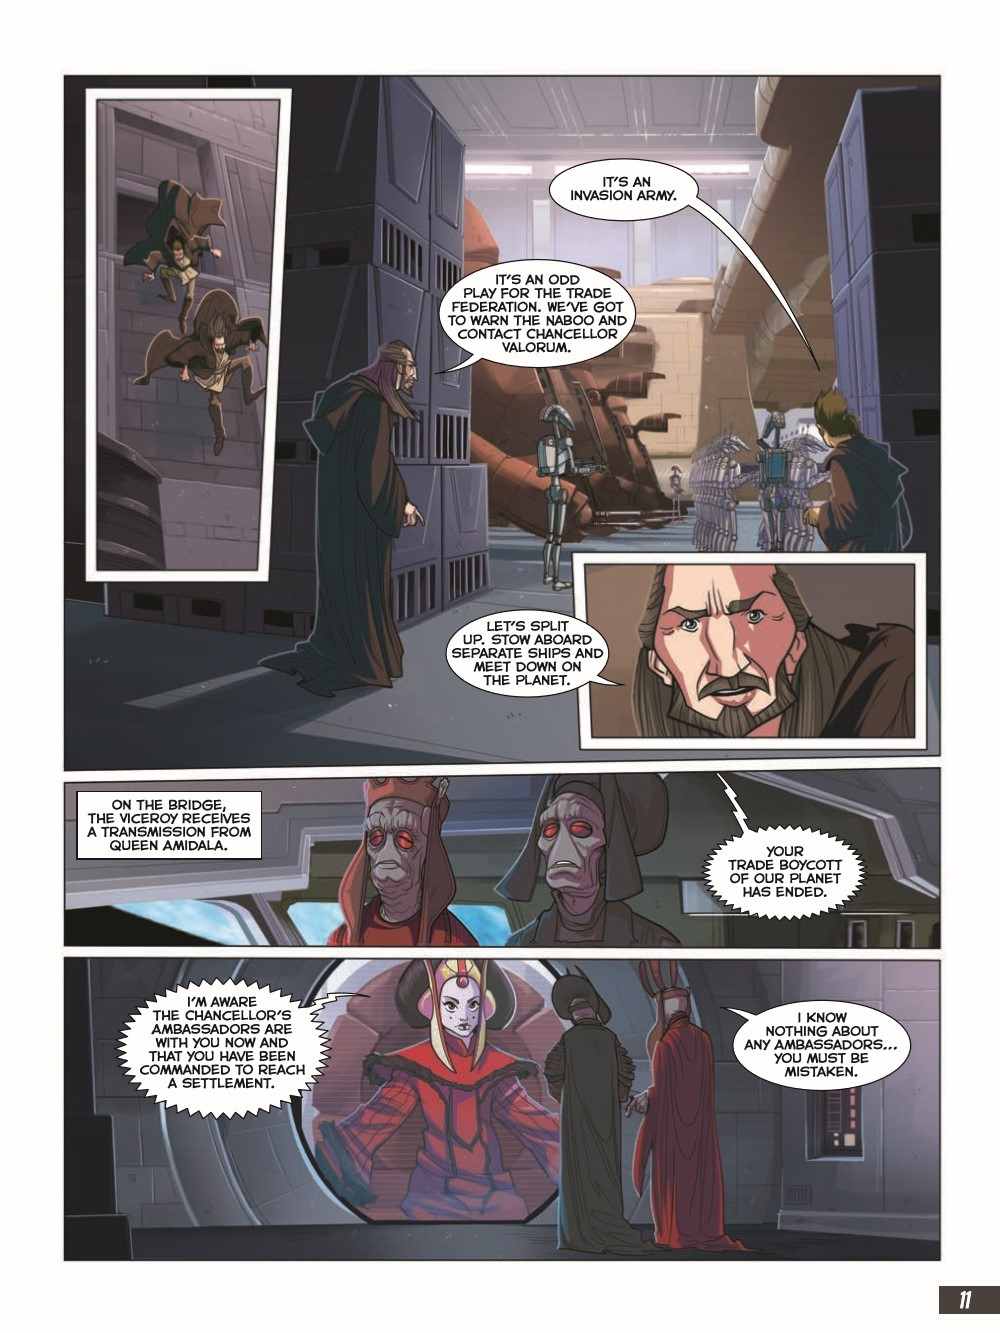 SW_The-Phantom-Menace_pr-7 ComicList Previews: STAR WARS THE PHANTOM MENACE GRAPHIC NOVEL ADAPTATION GN